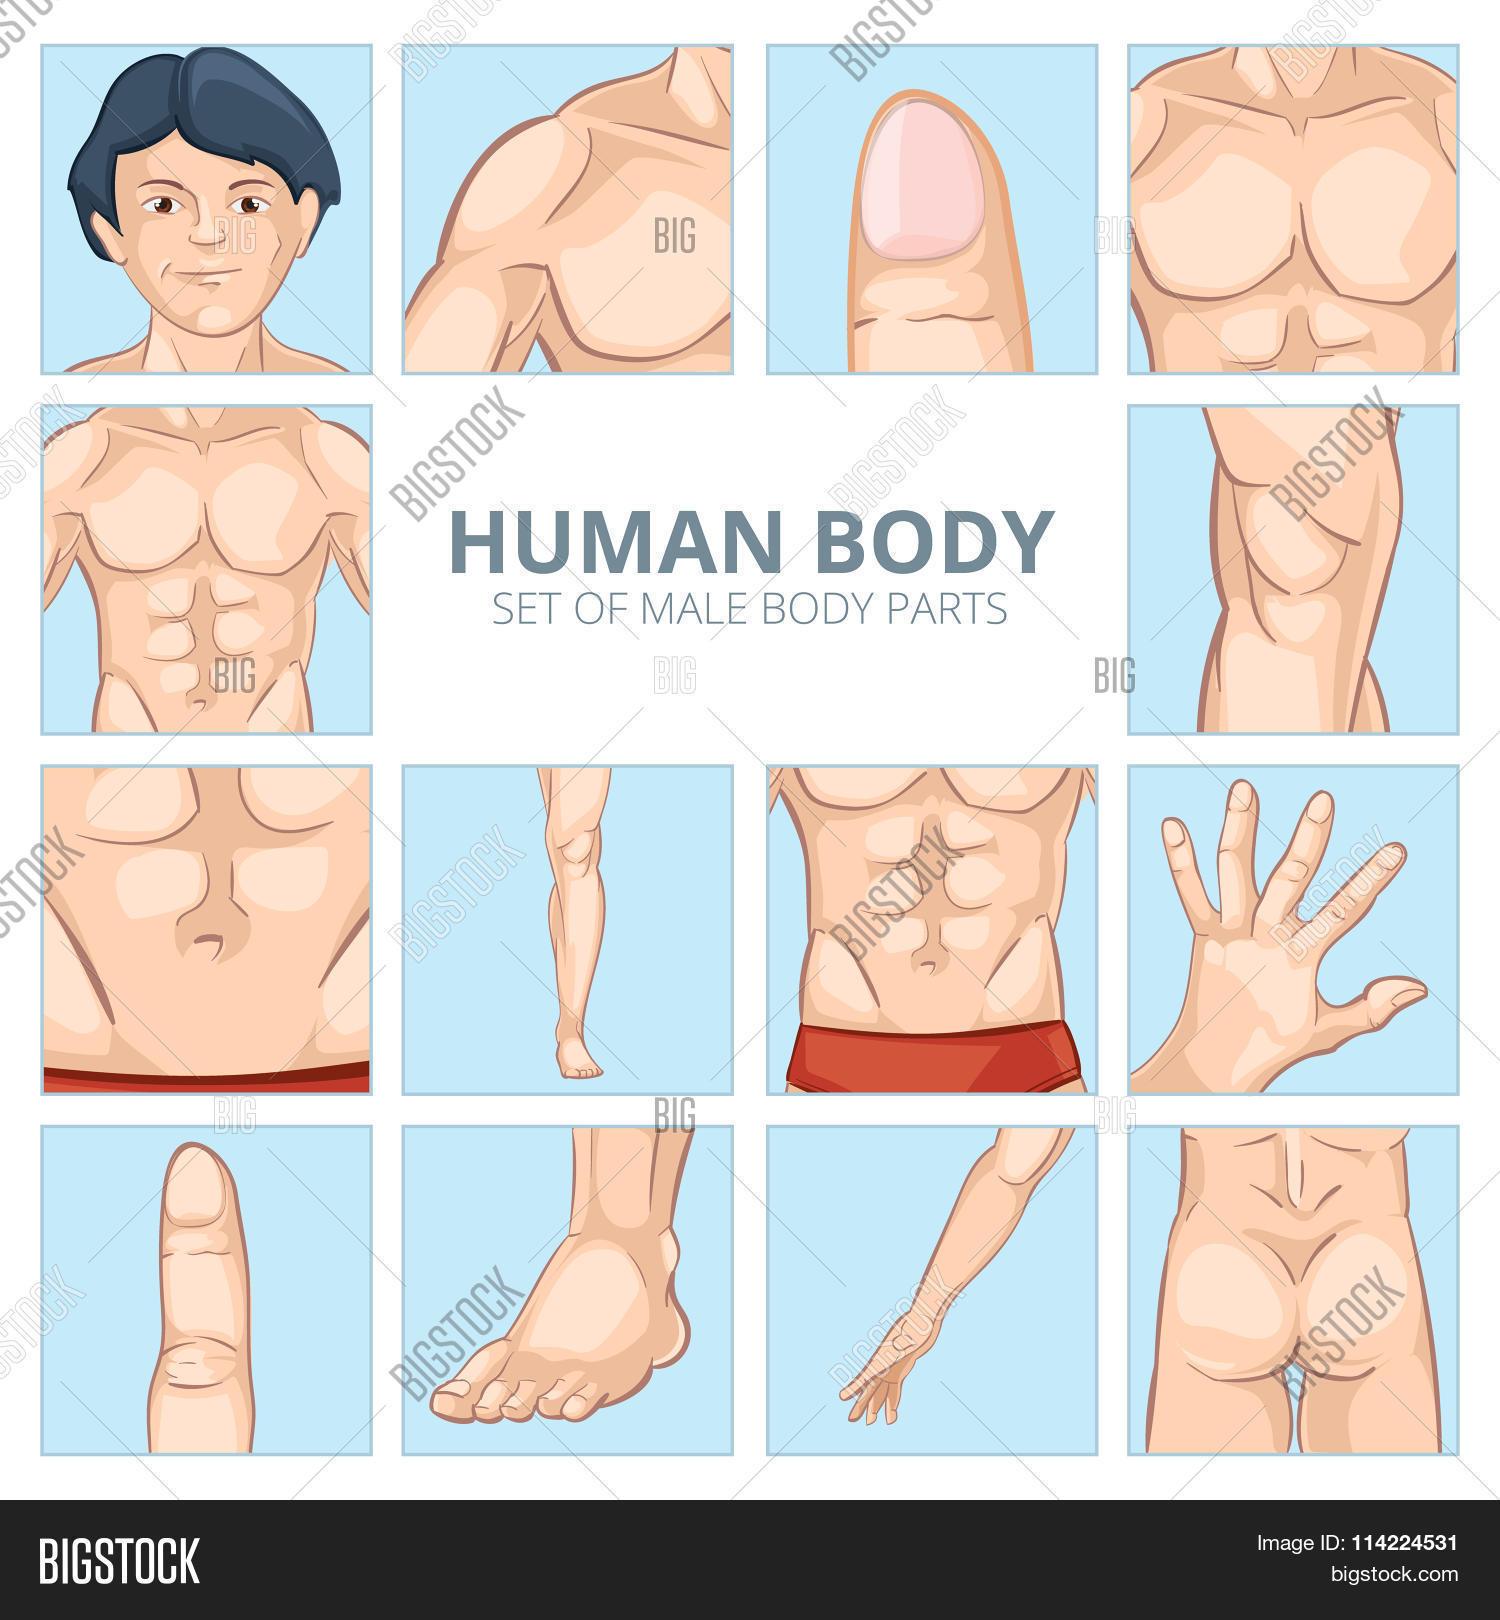 Male Body Parts Vector & Photo (Free Trial) | Bigstock